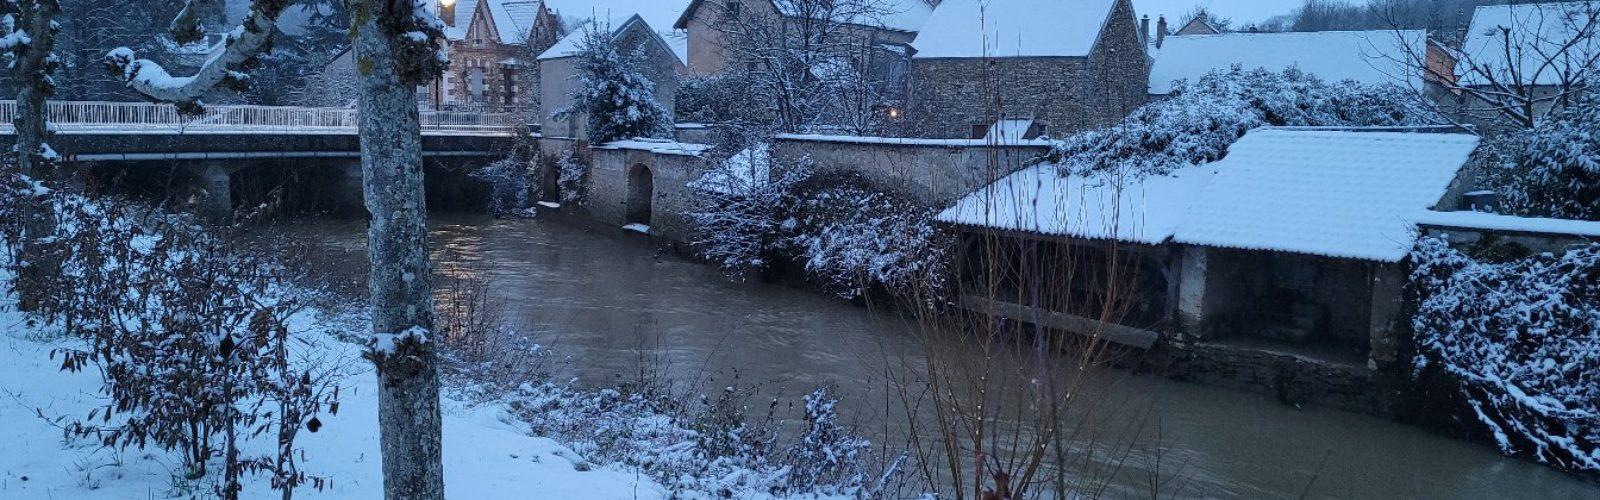 Mairie de Jouy-sur-Morin